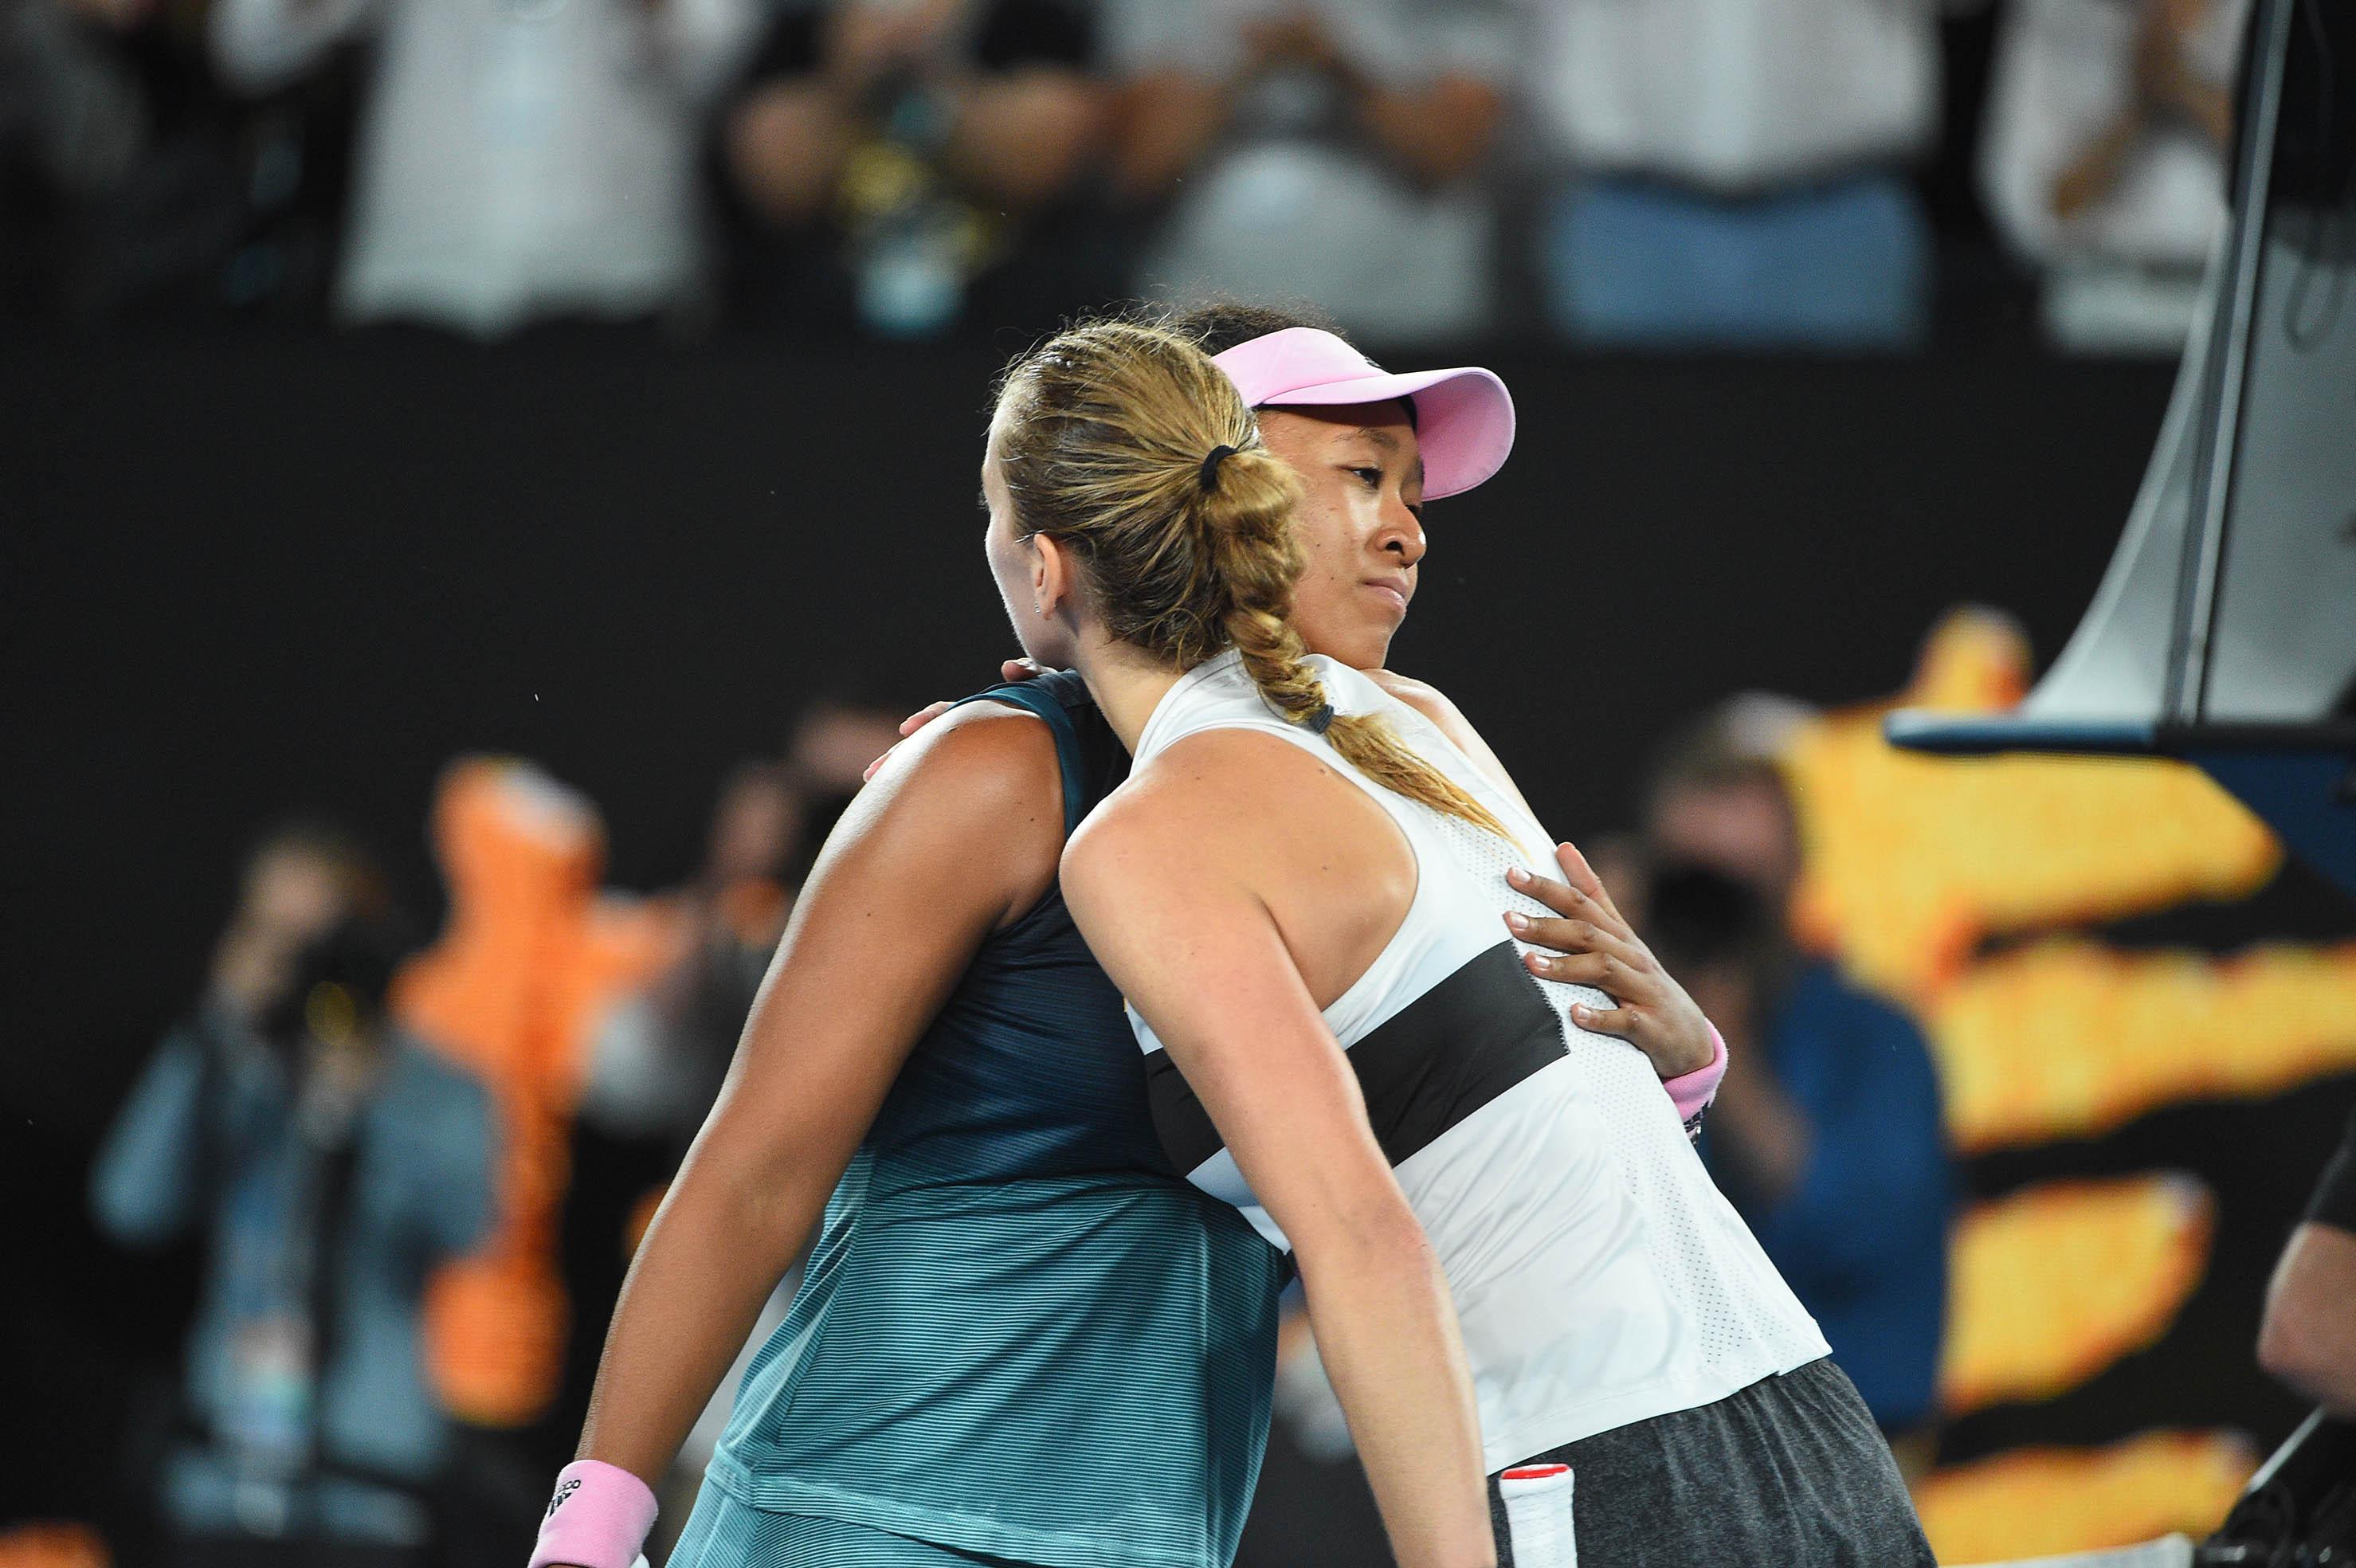 Nice hug at the net between Naomi OSaka and Petra Kvitova at the 2019 Australian Open